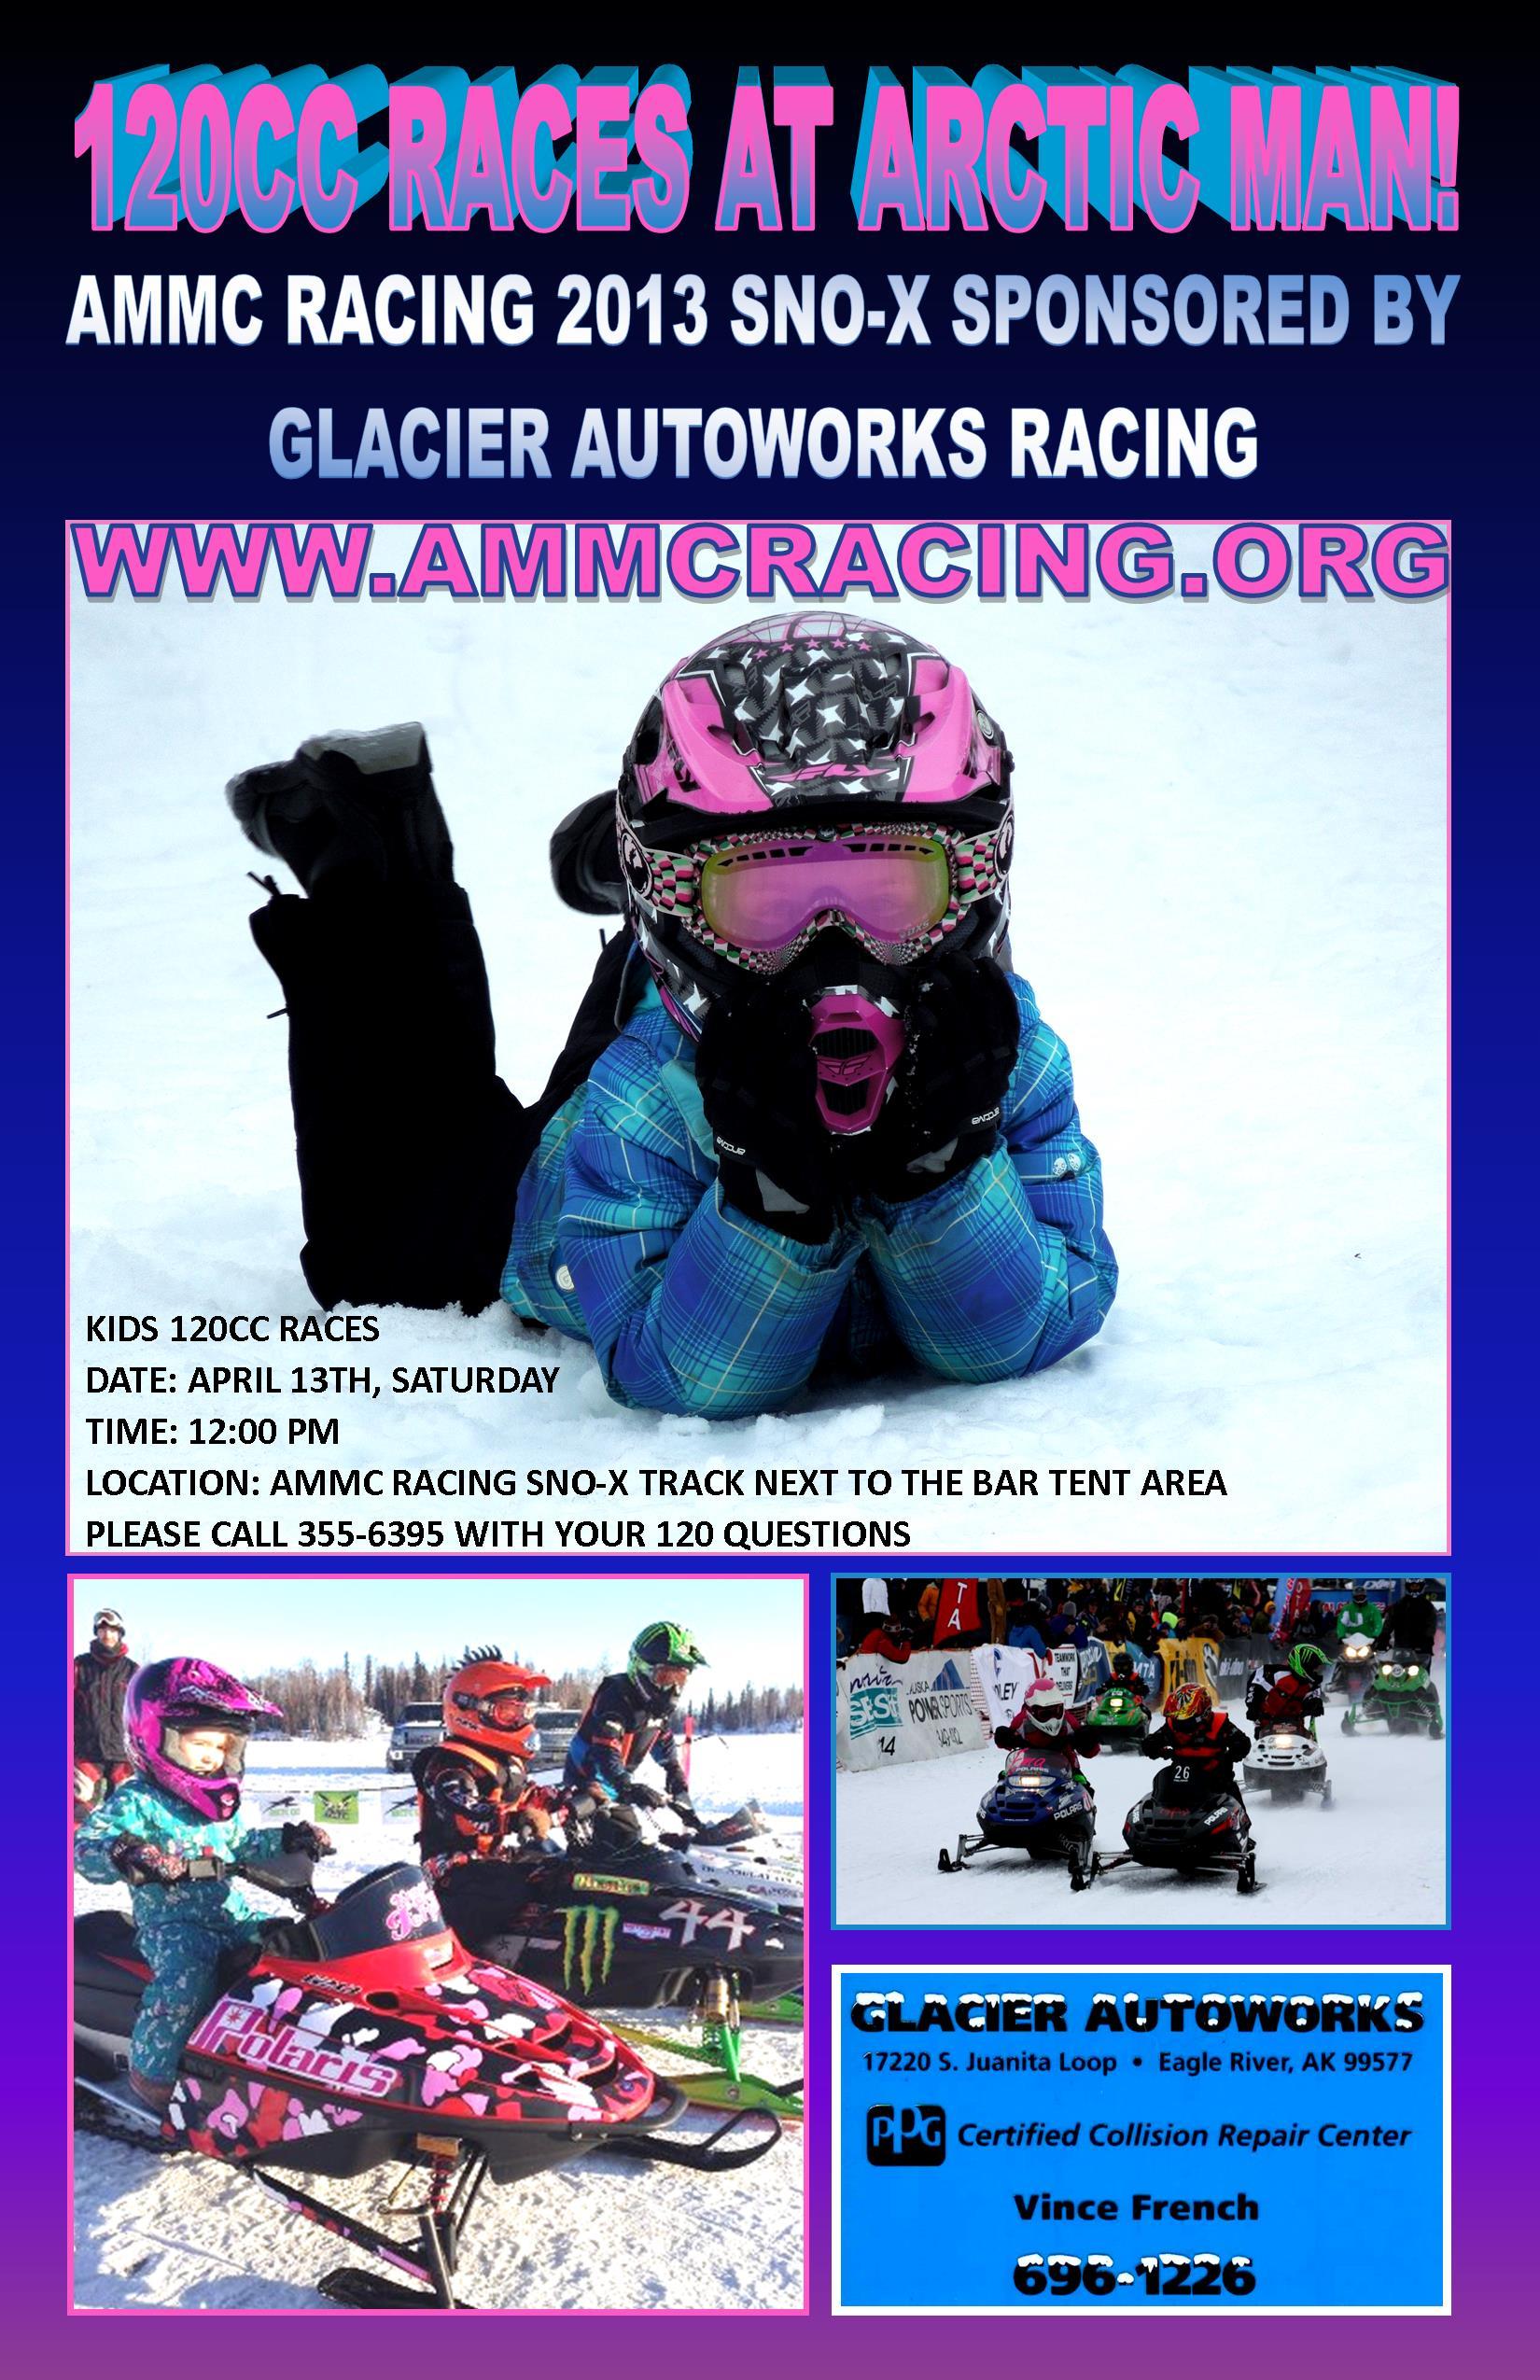 KIDS 120 RACES